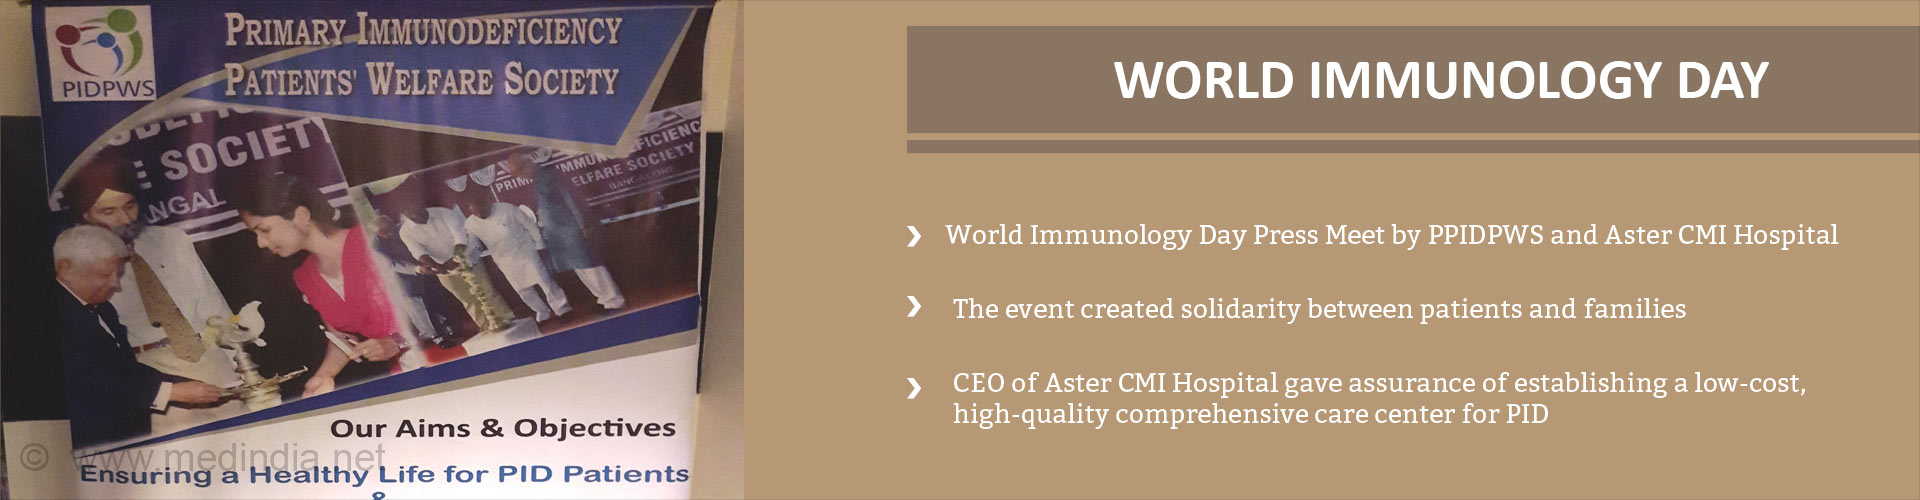 World Immunology Day 2017